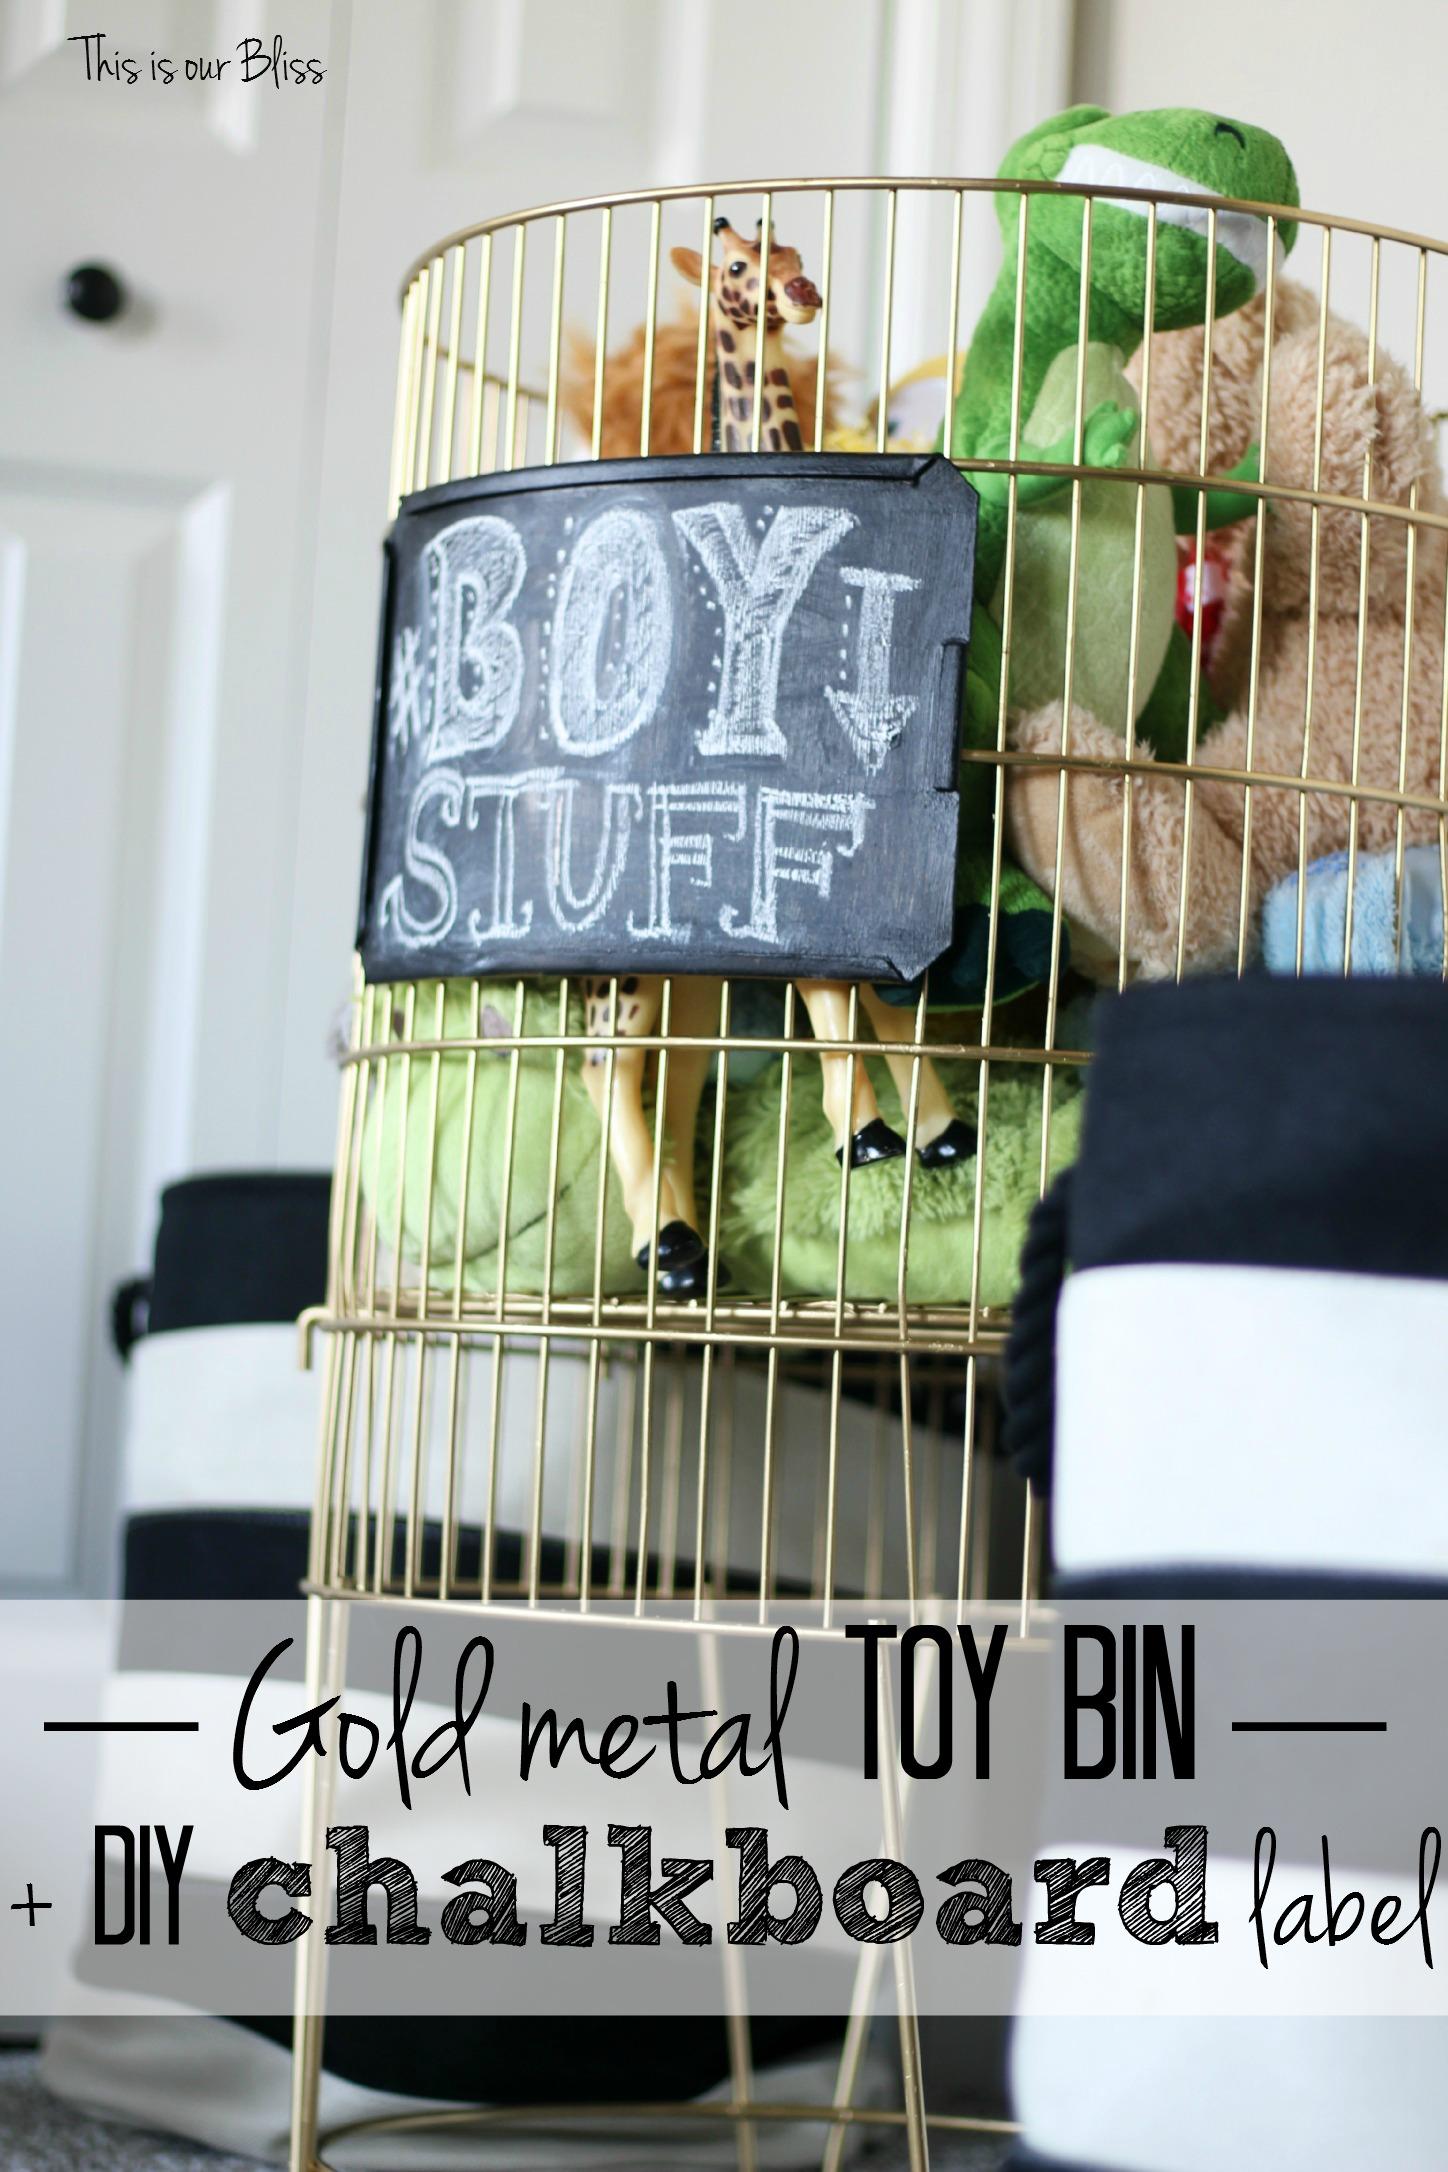 Gold Metal Toy Bin Chalkboard Label Basement Playroom